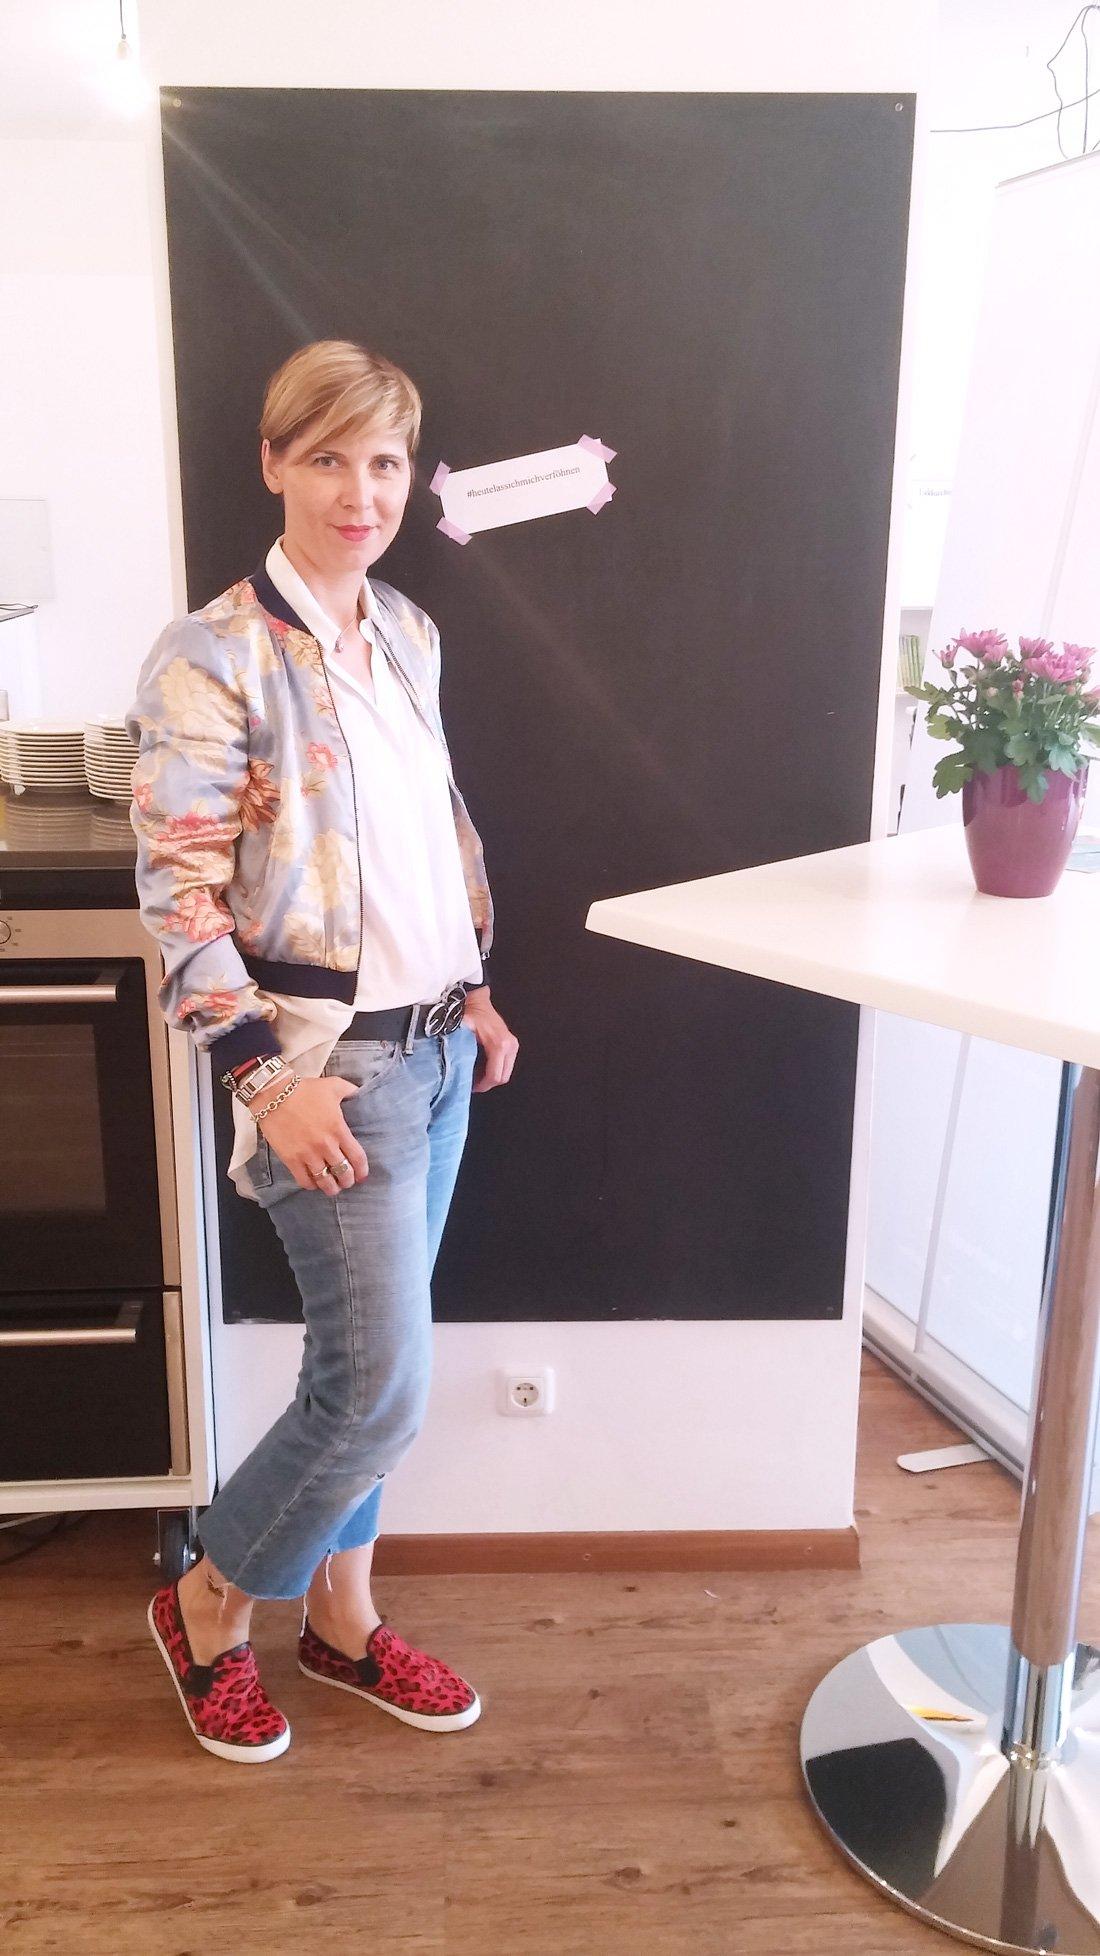 20160713_153502[1]--treatwell-stilgeflüster--bildundraum-event-münchen-munich-connydoll-ü40blogger